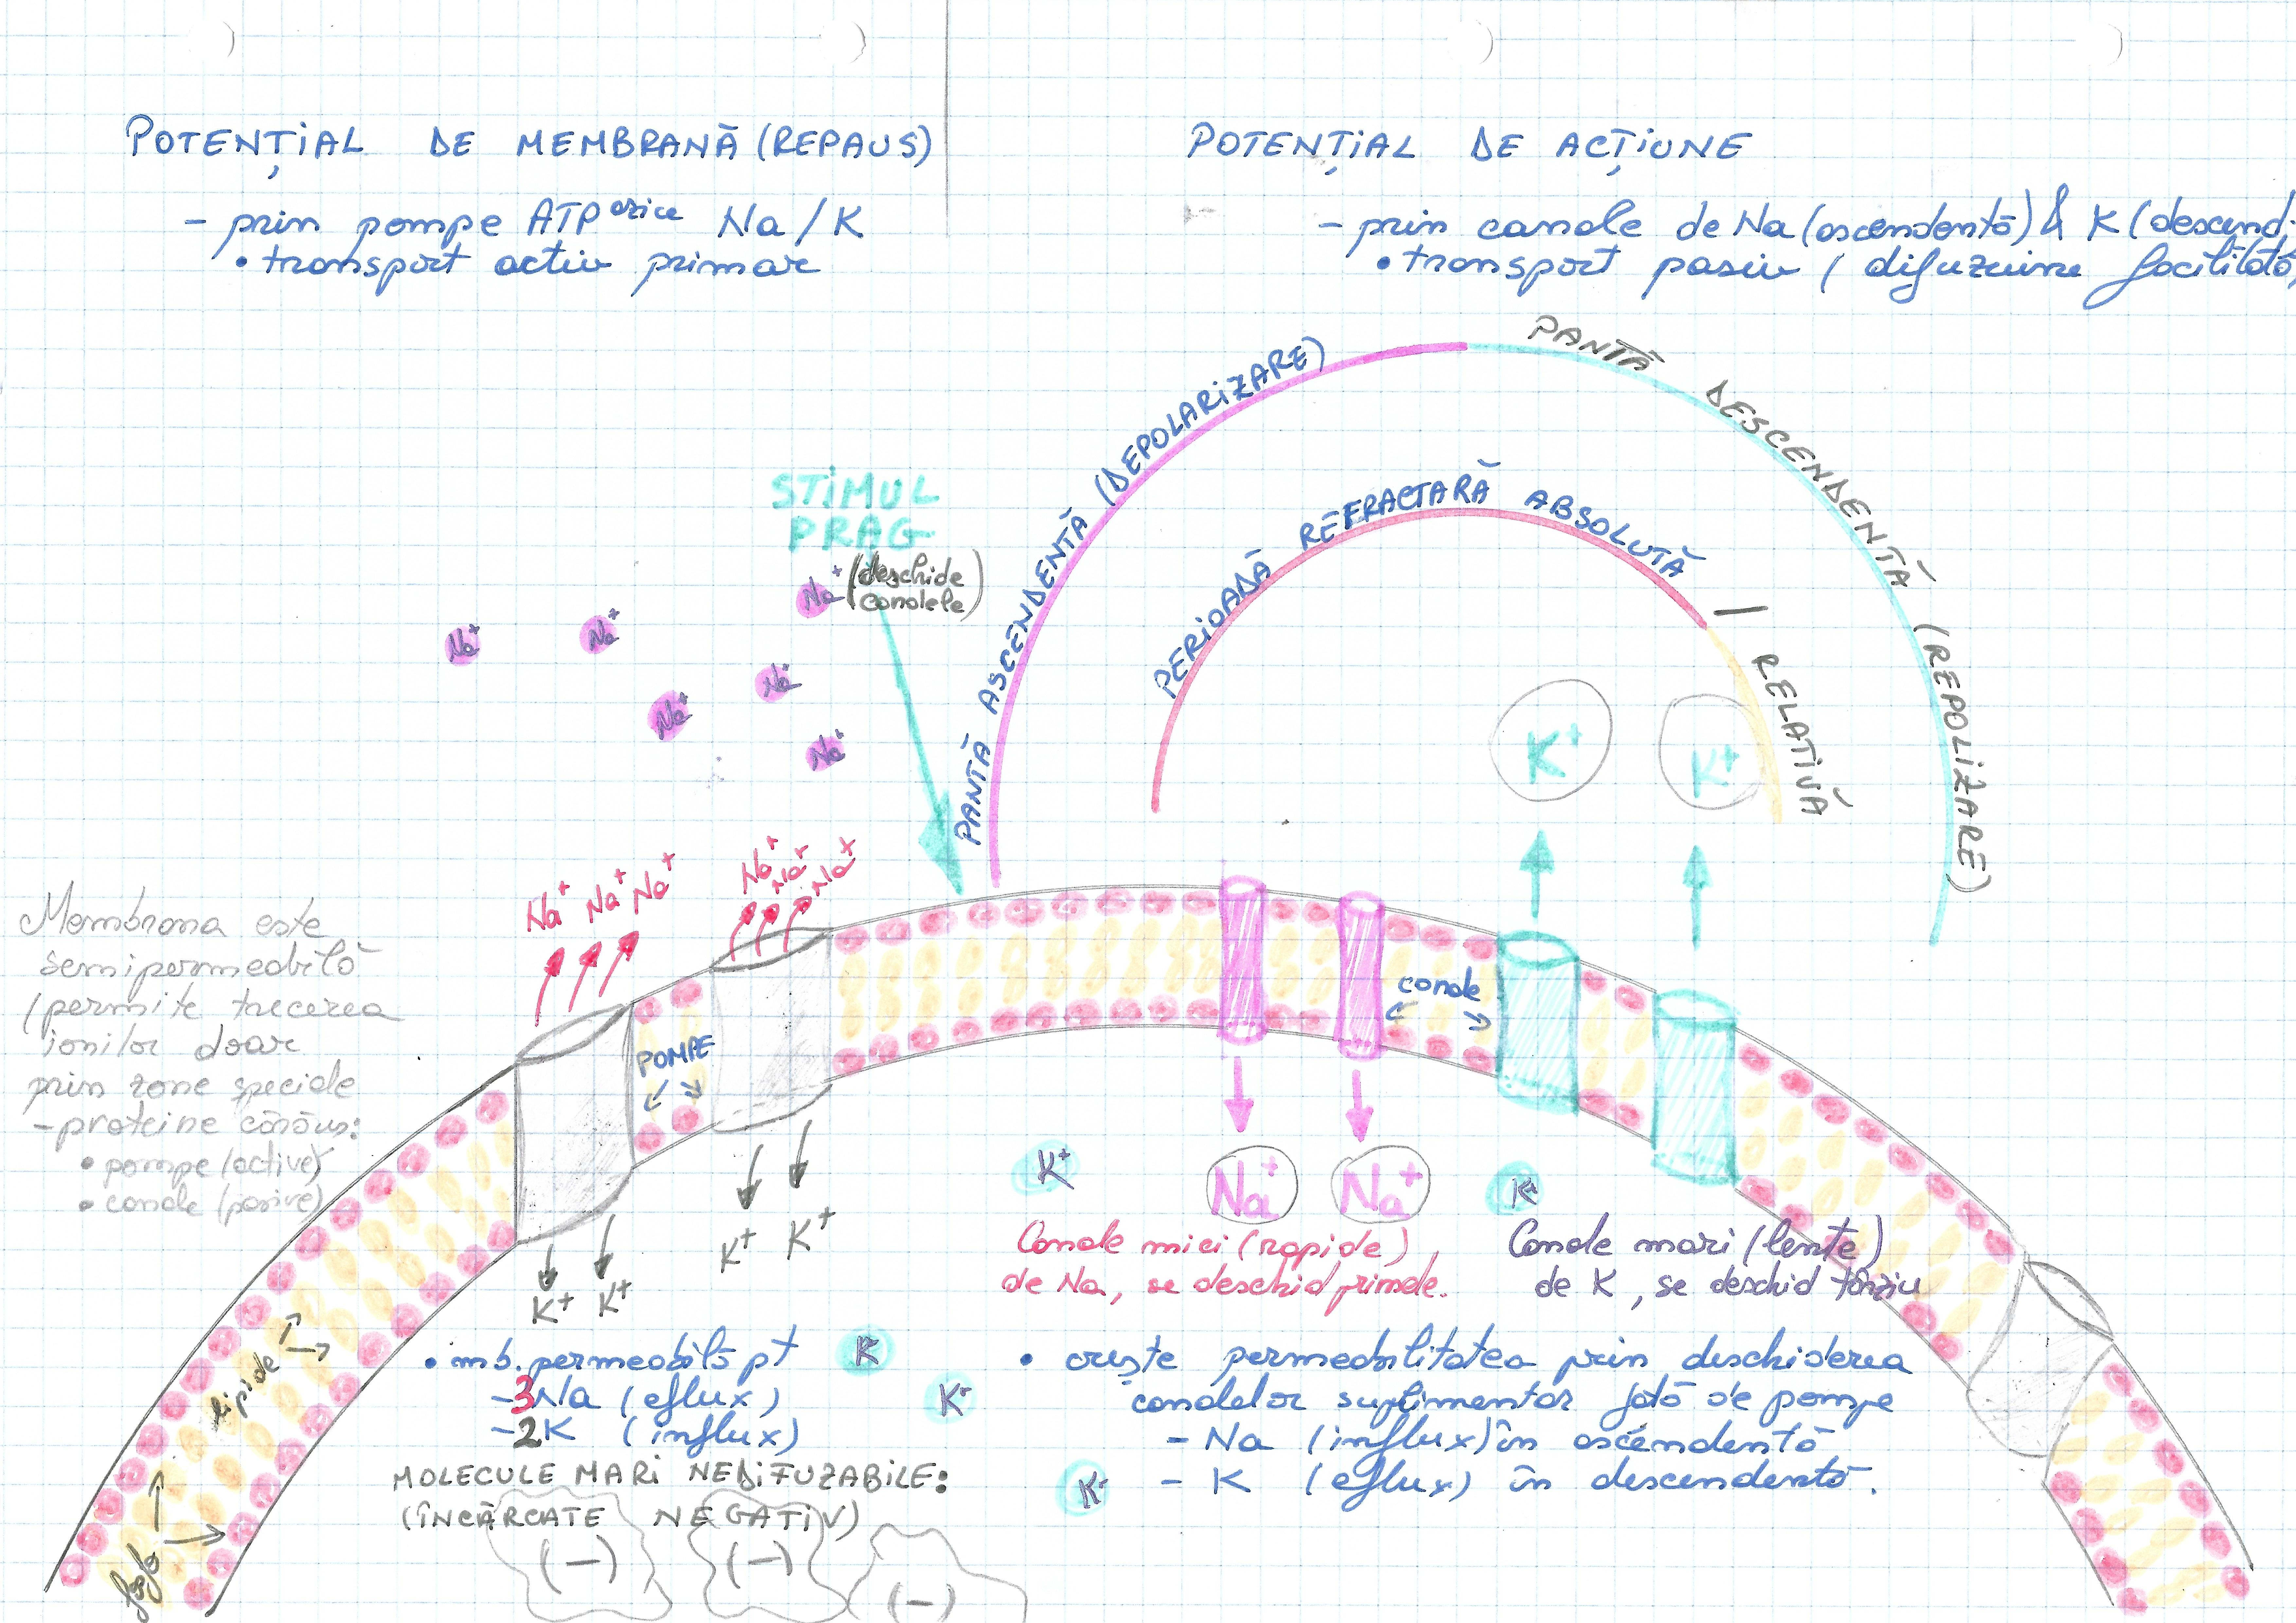 celula-potential de membrana